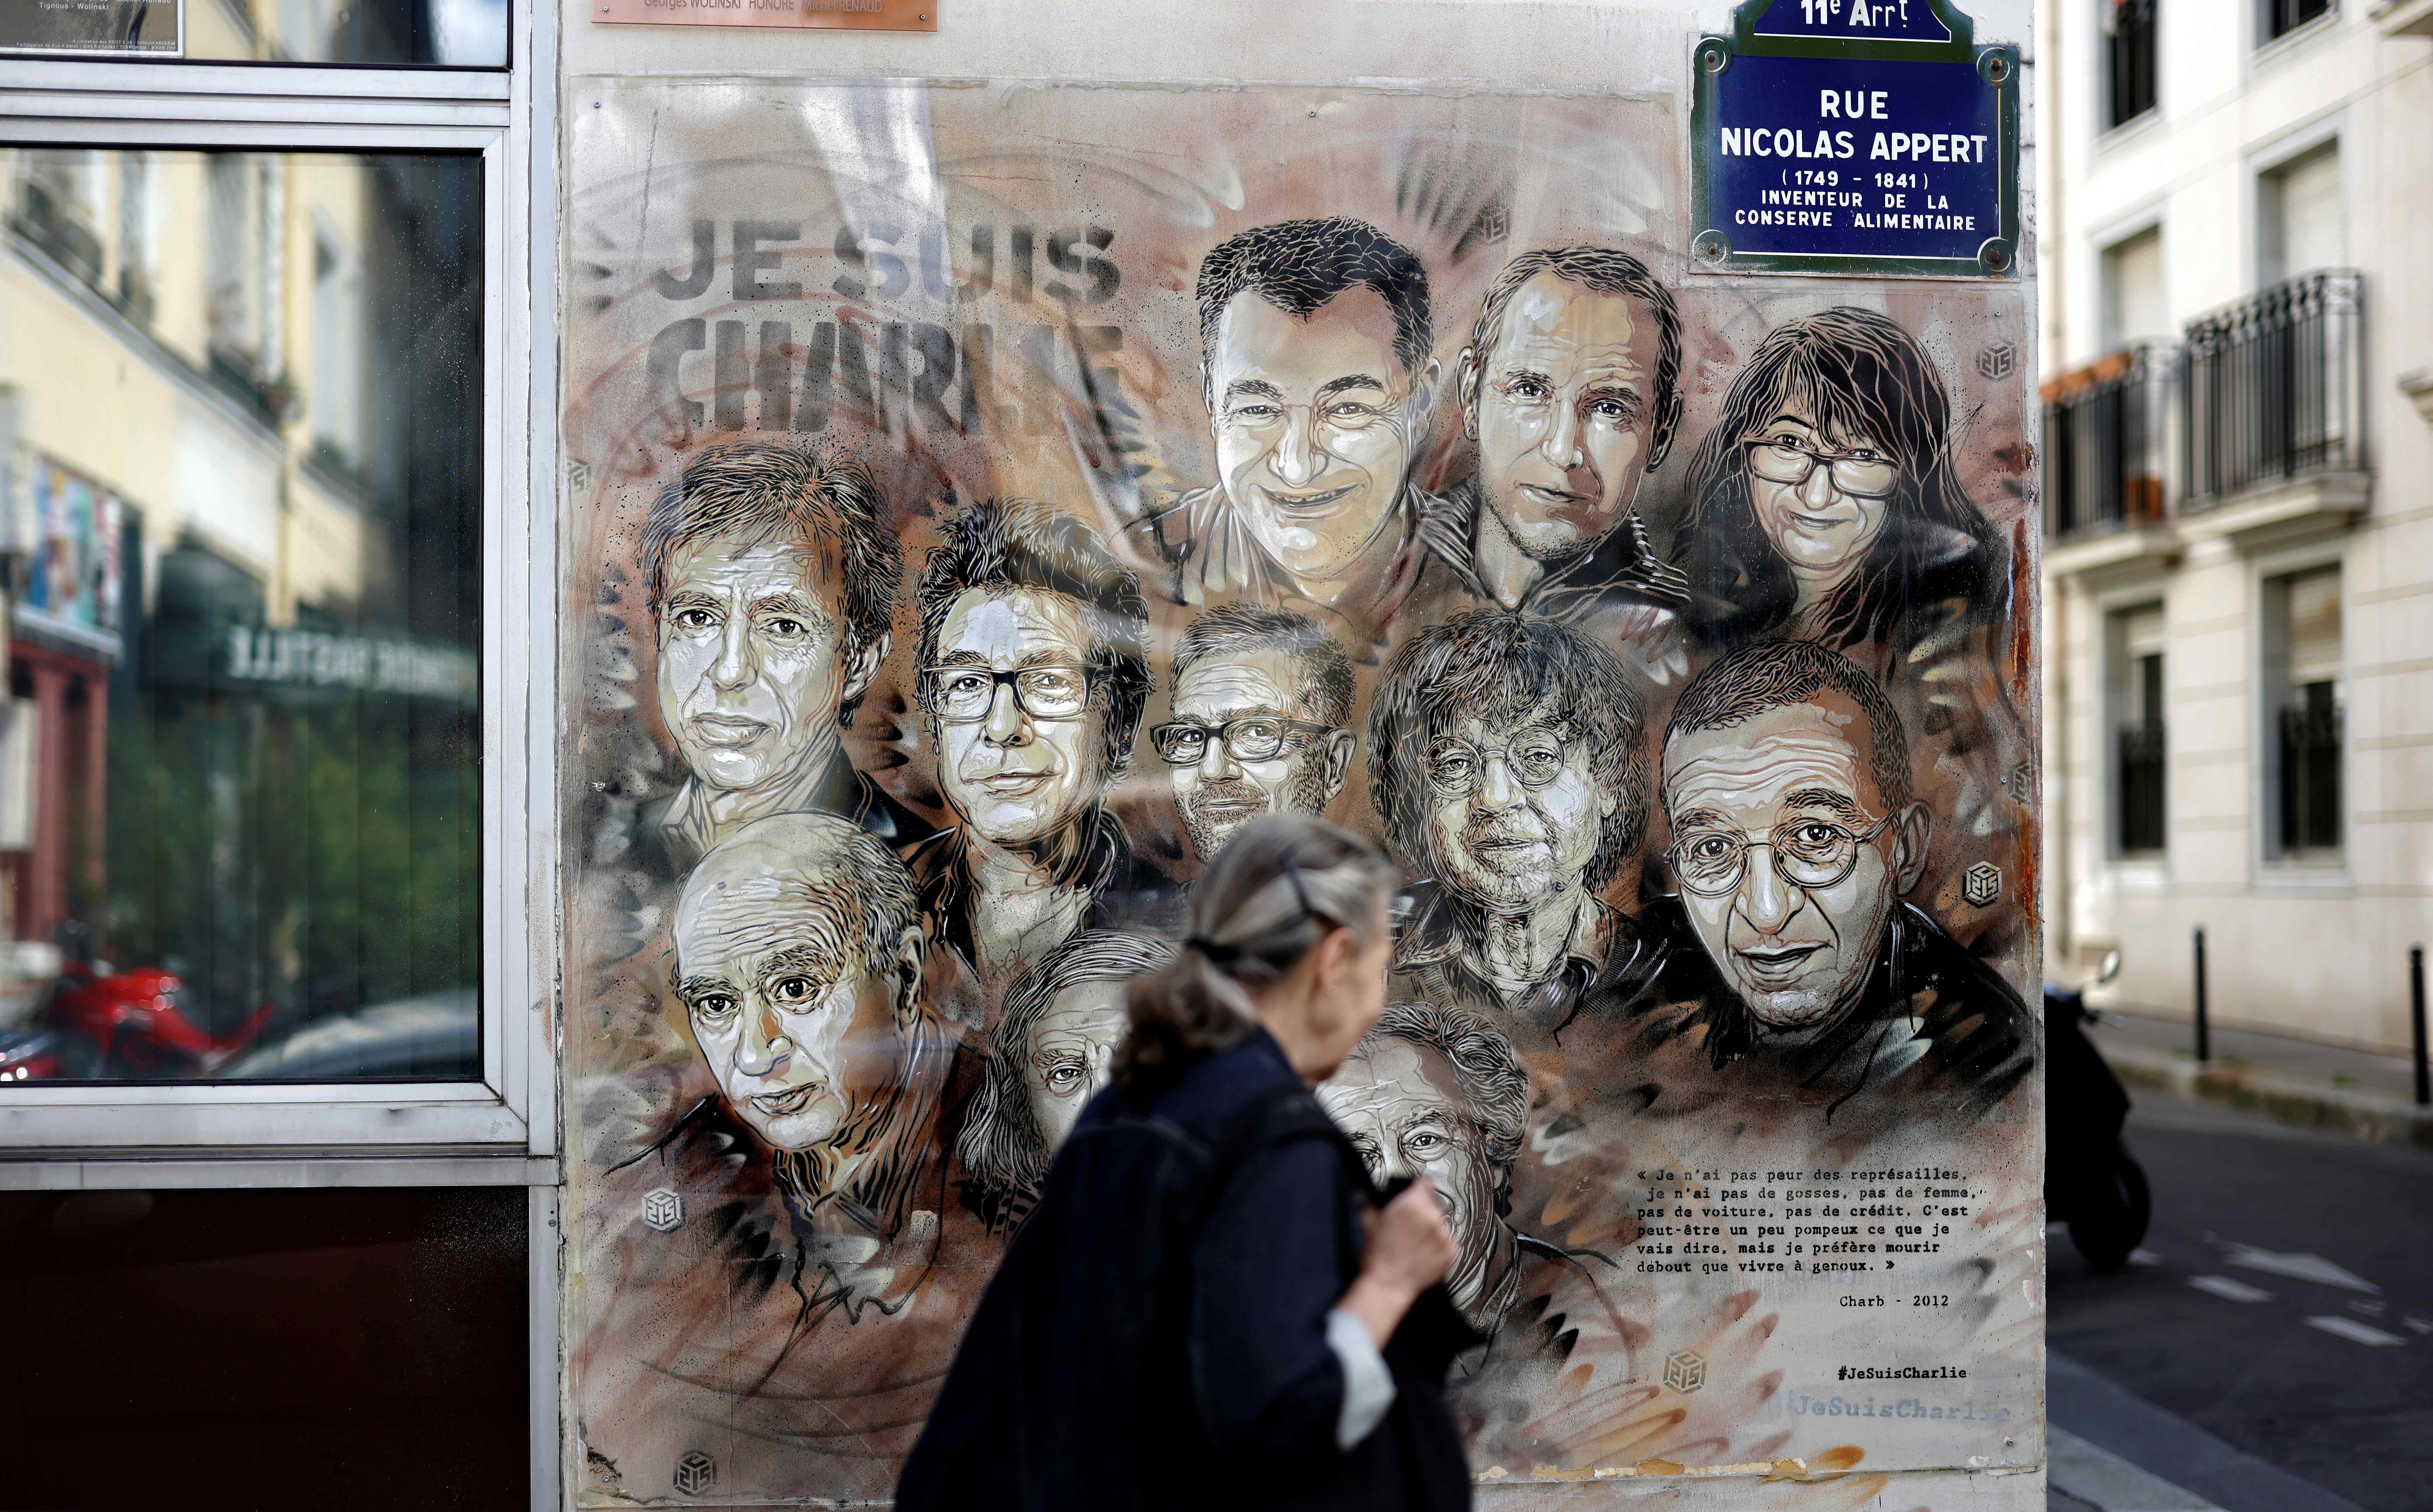 Charlie Hebdo Republishes Muhammad Cartoon Ahead Of Shooting Trial The Washington Post